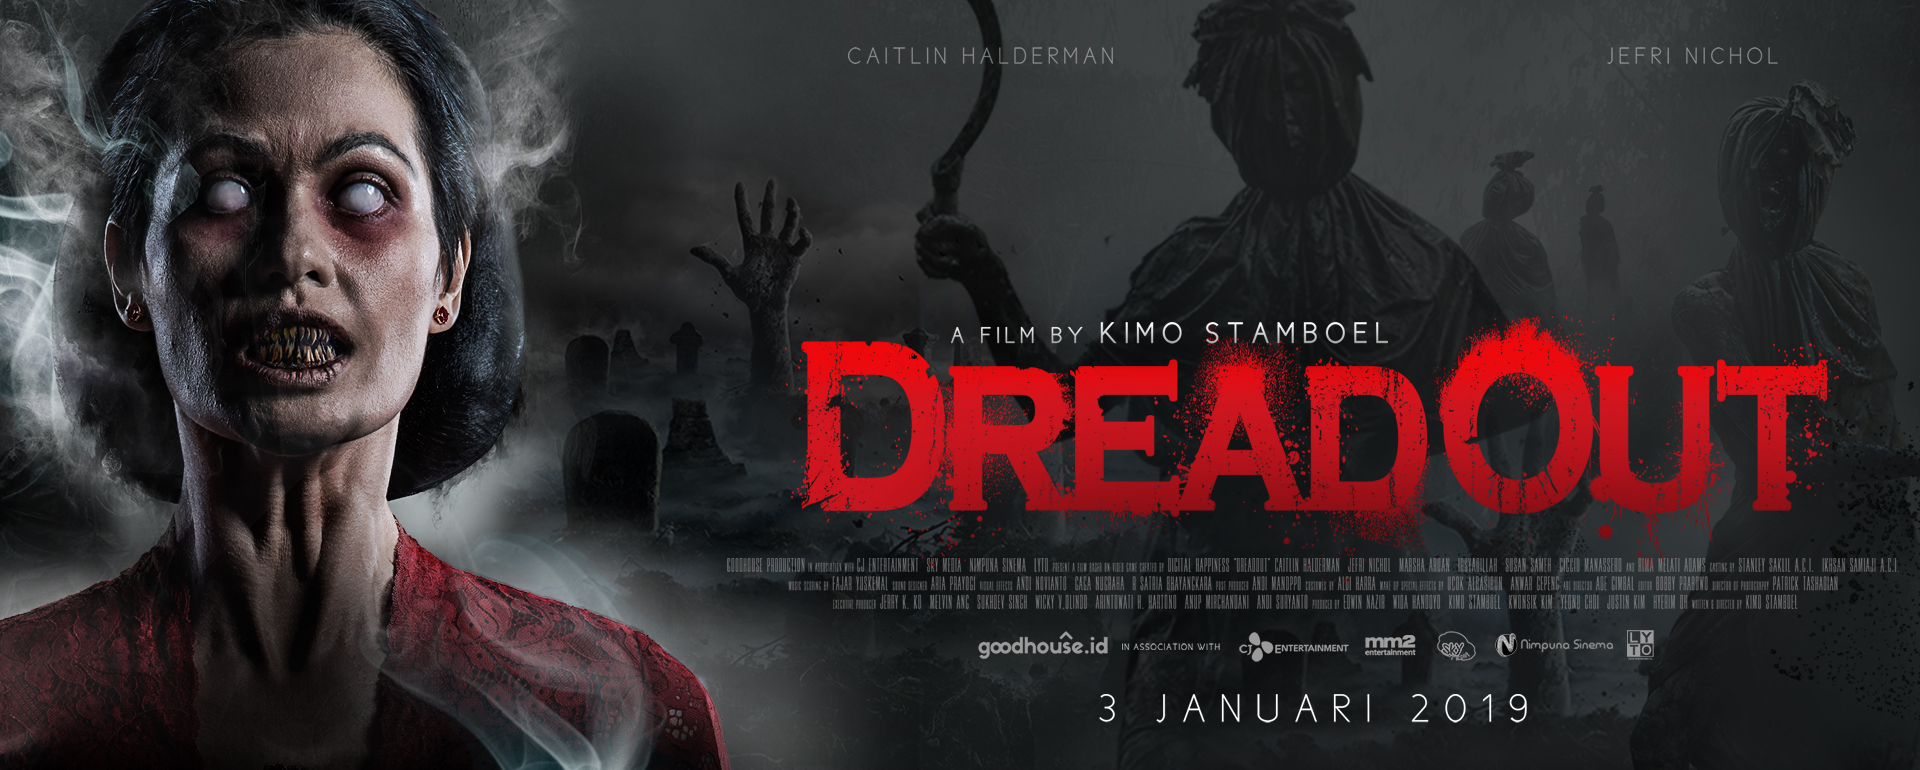 [LYTO] DreadOut Movie Tayang 3 Januari 2019